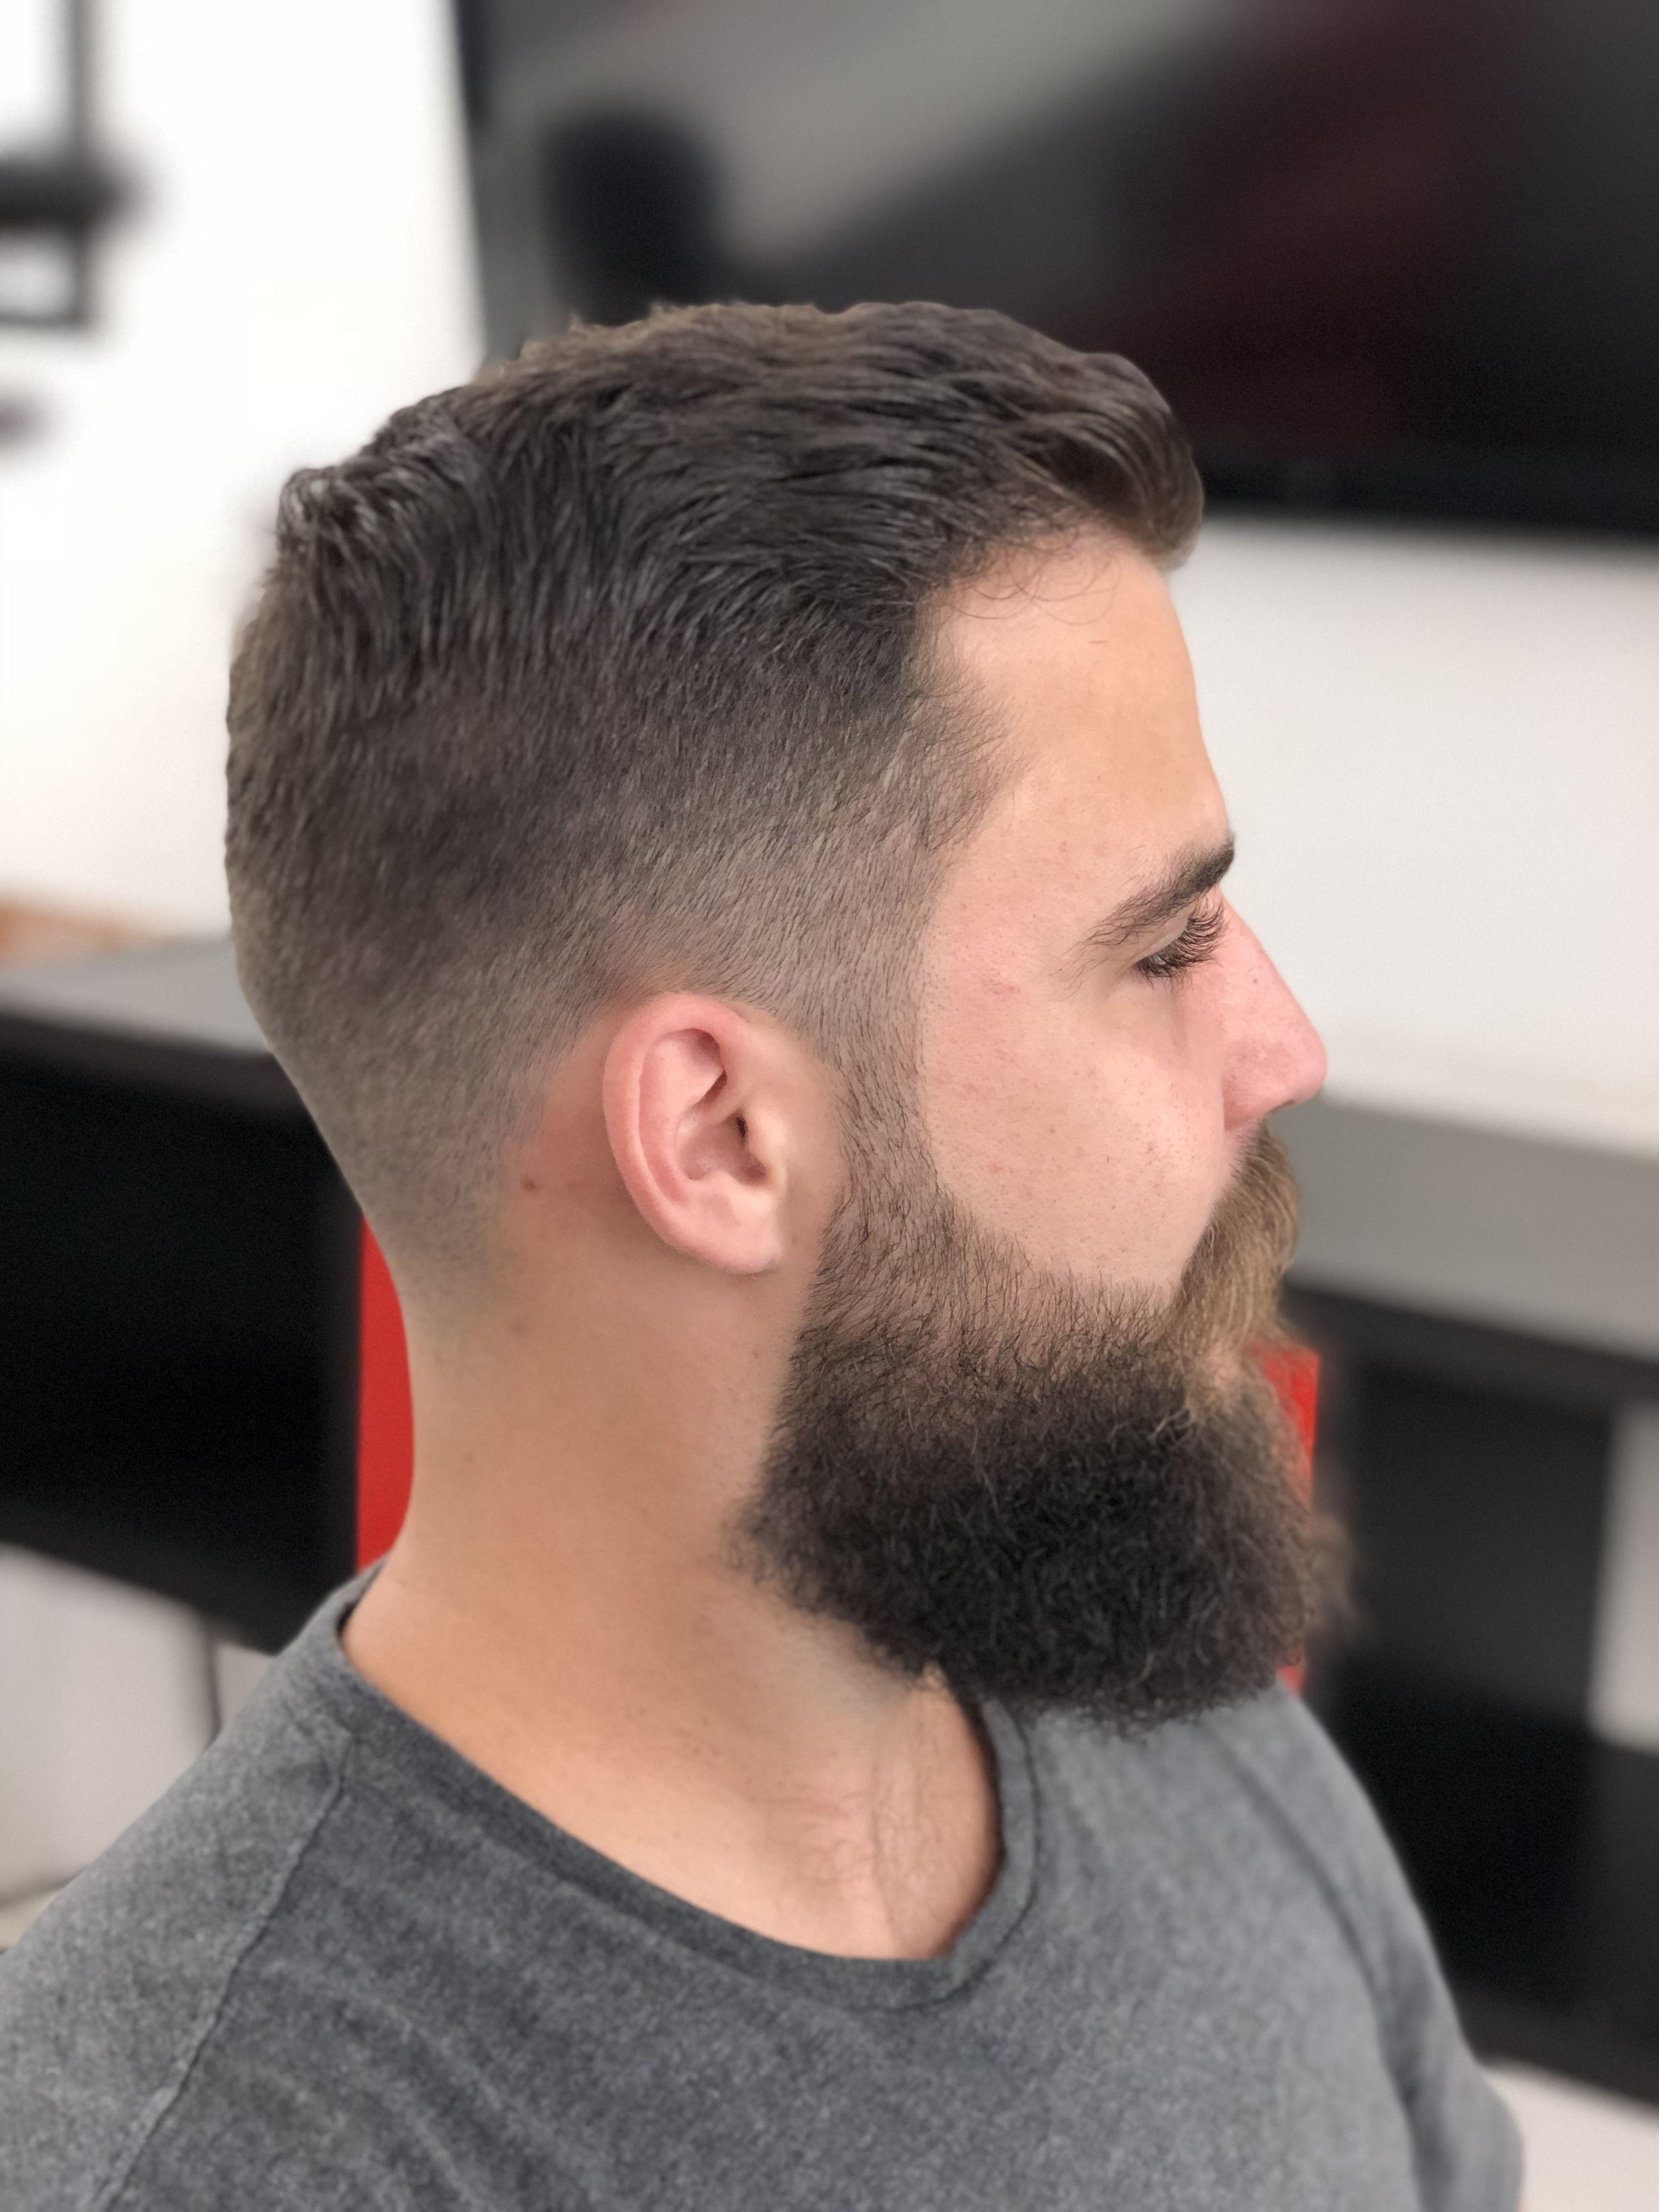 Very Short Hair And Beard Styles For Men